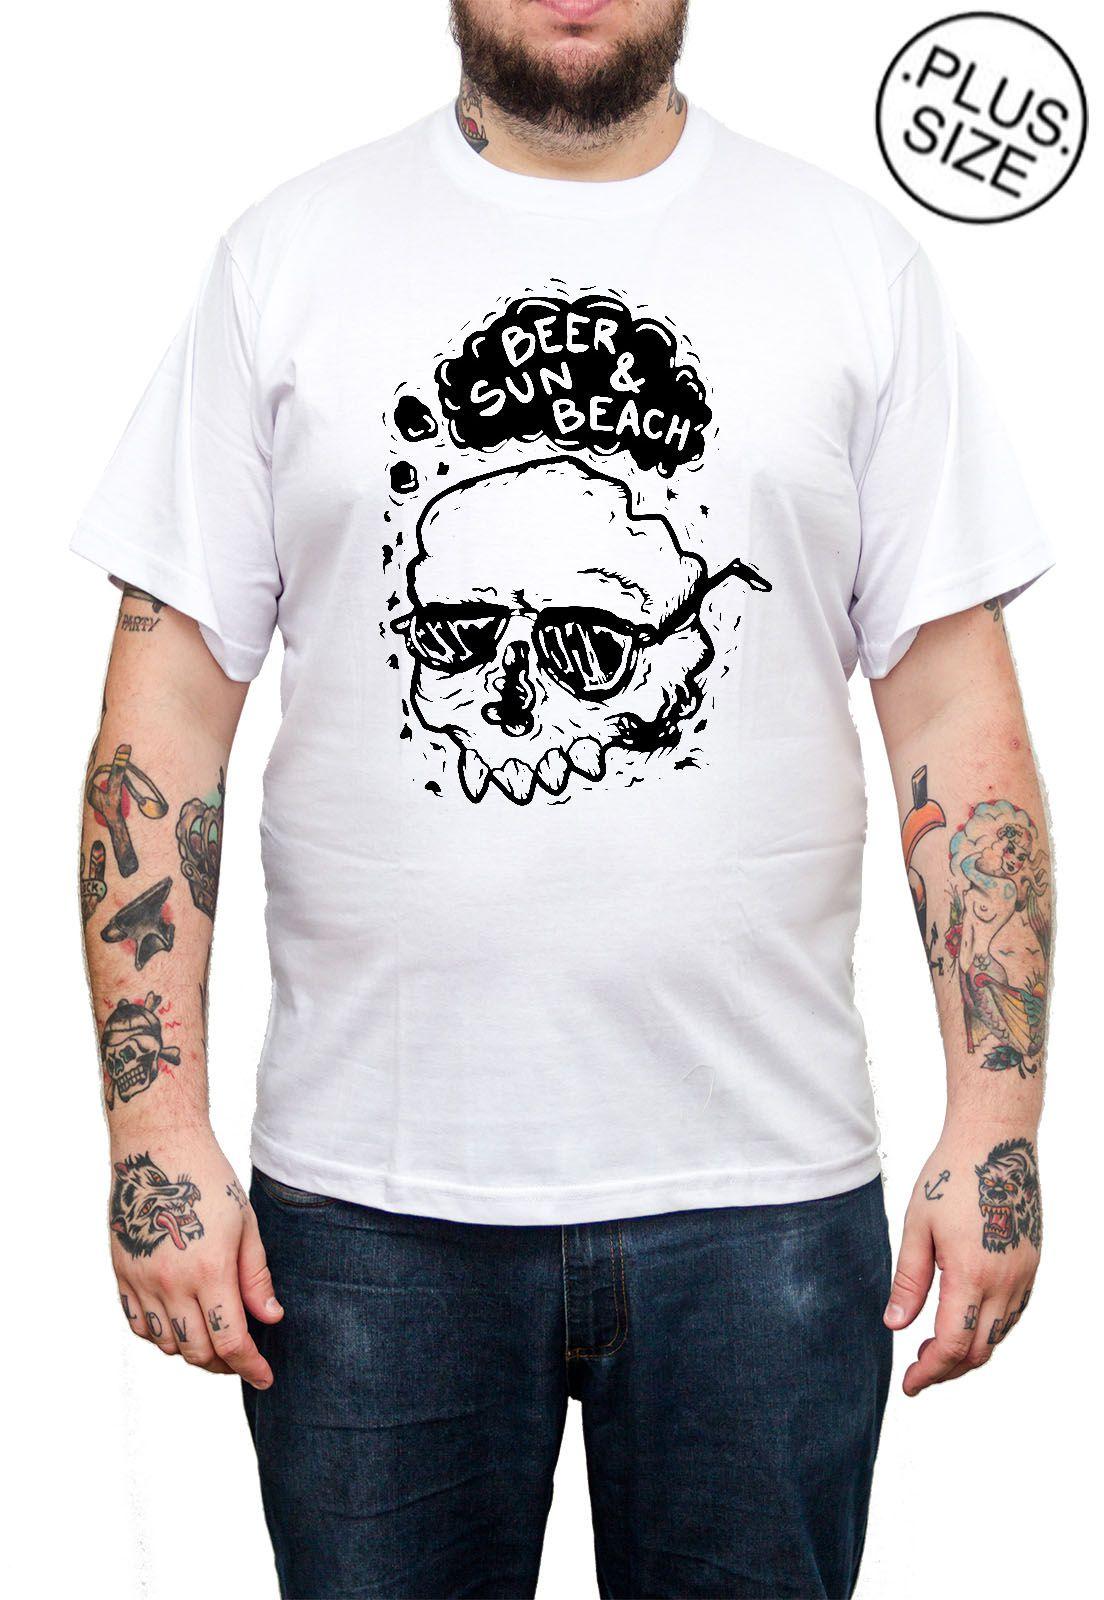 Camiseta Hshop Beer Sun - Branco - Plus Size - Tamanho Grande XG  - HShop